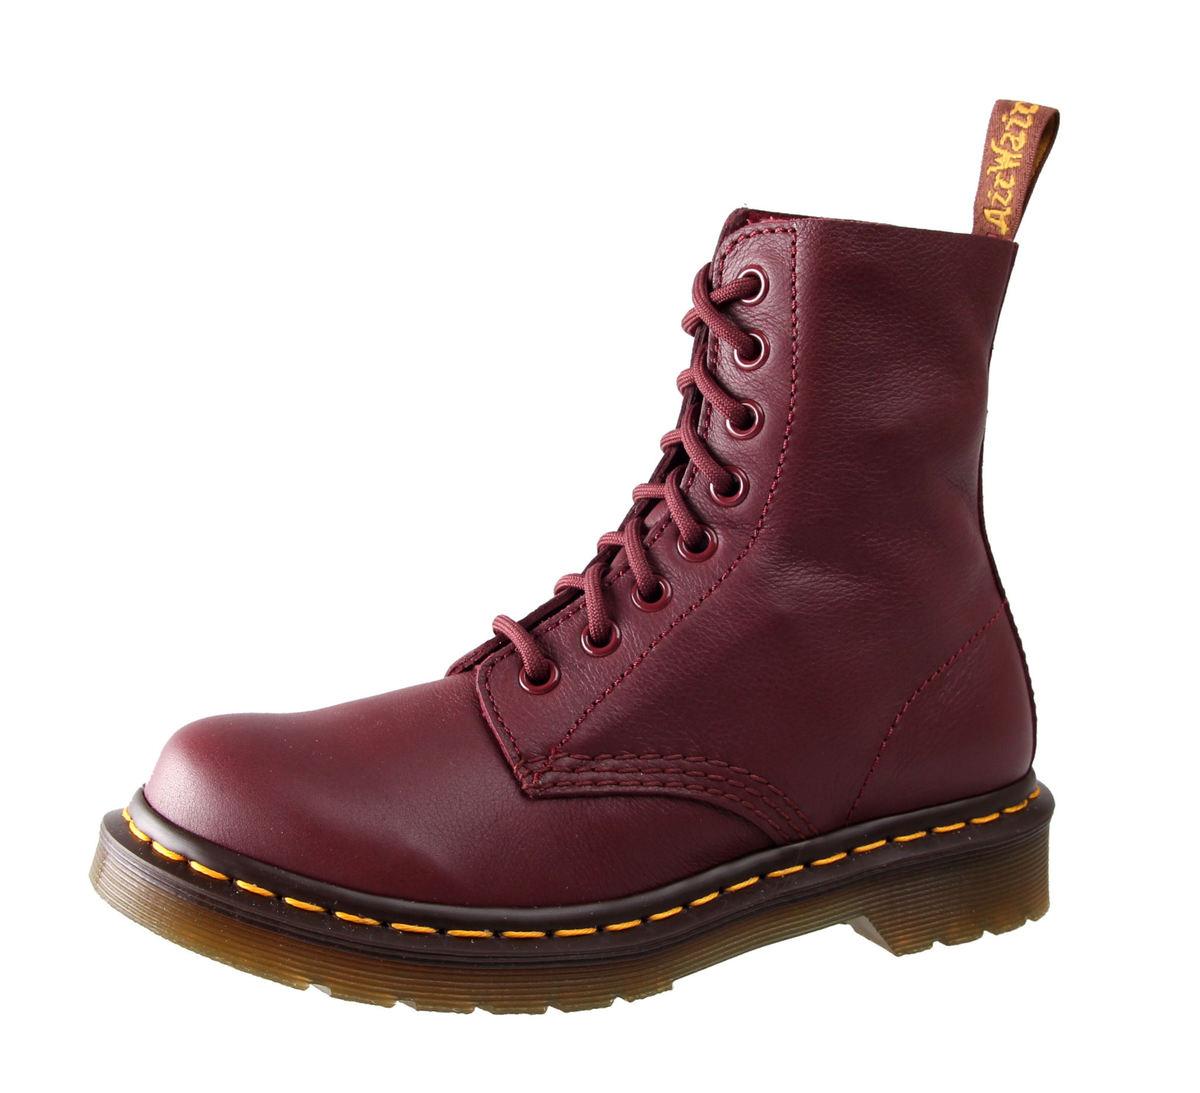 boty Dr. Martens - 8 dírkové - Pascal Cherry Red Virginia - DR004